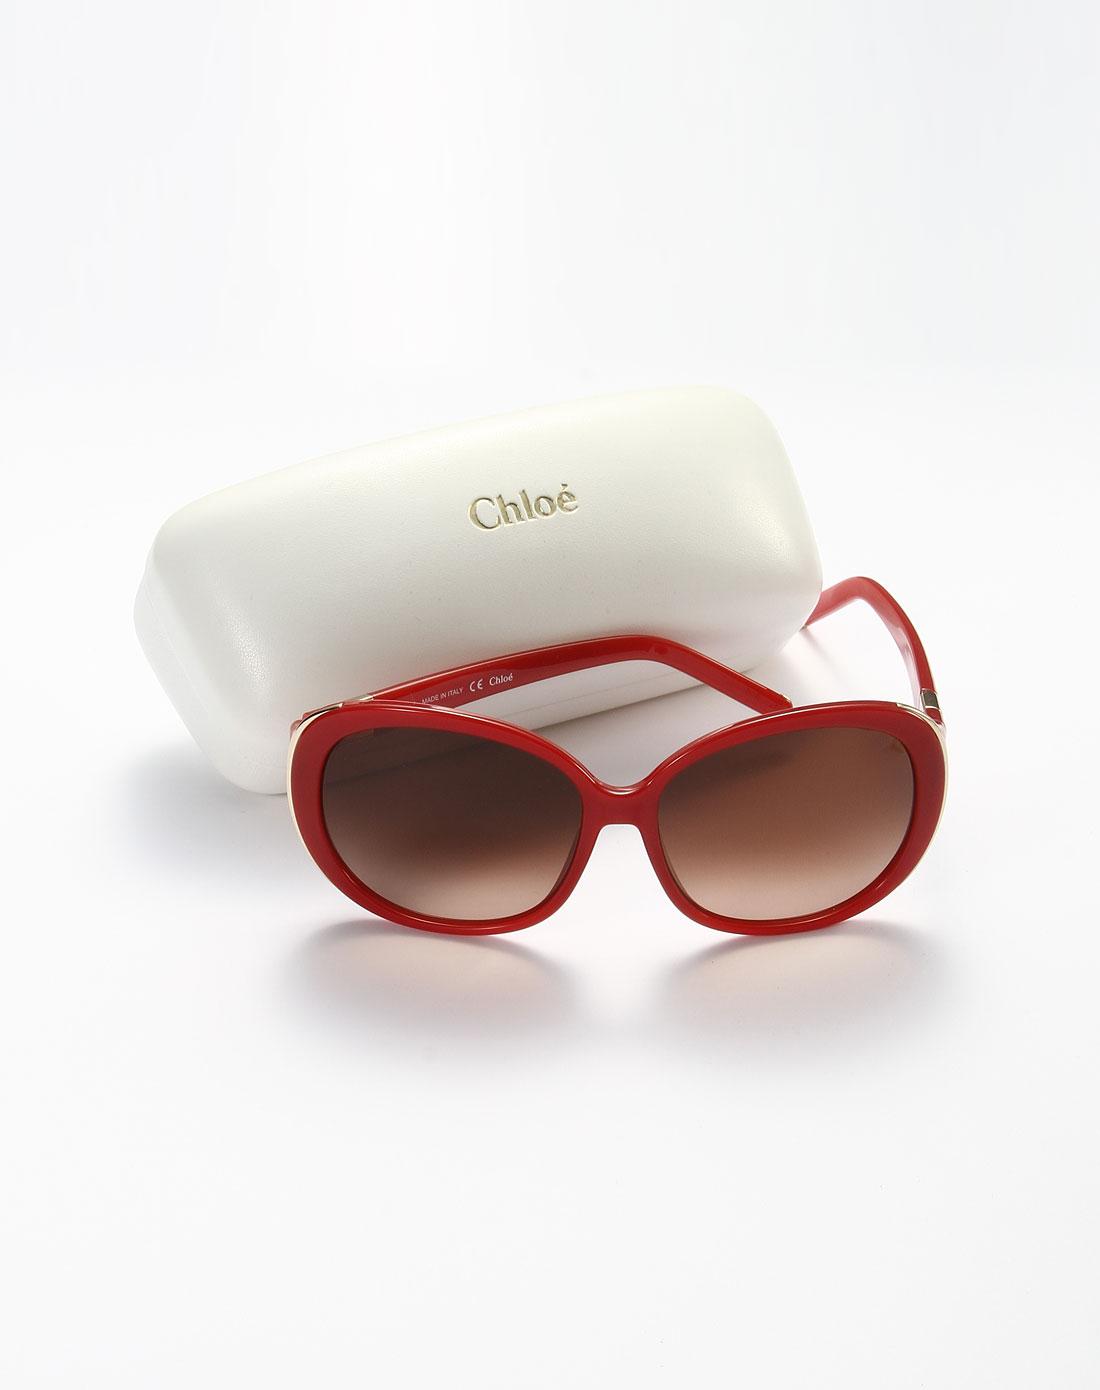 chloe太阳眼镜专场女款可爱迷人板材全框太阳镜红色ce